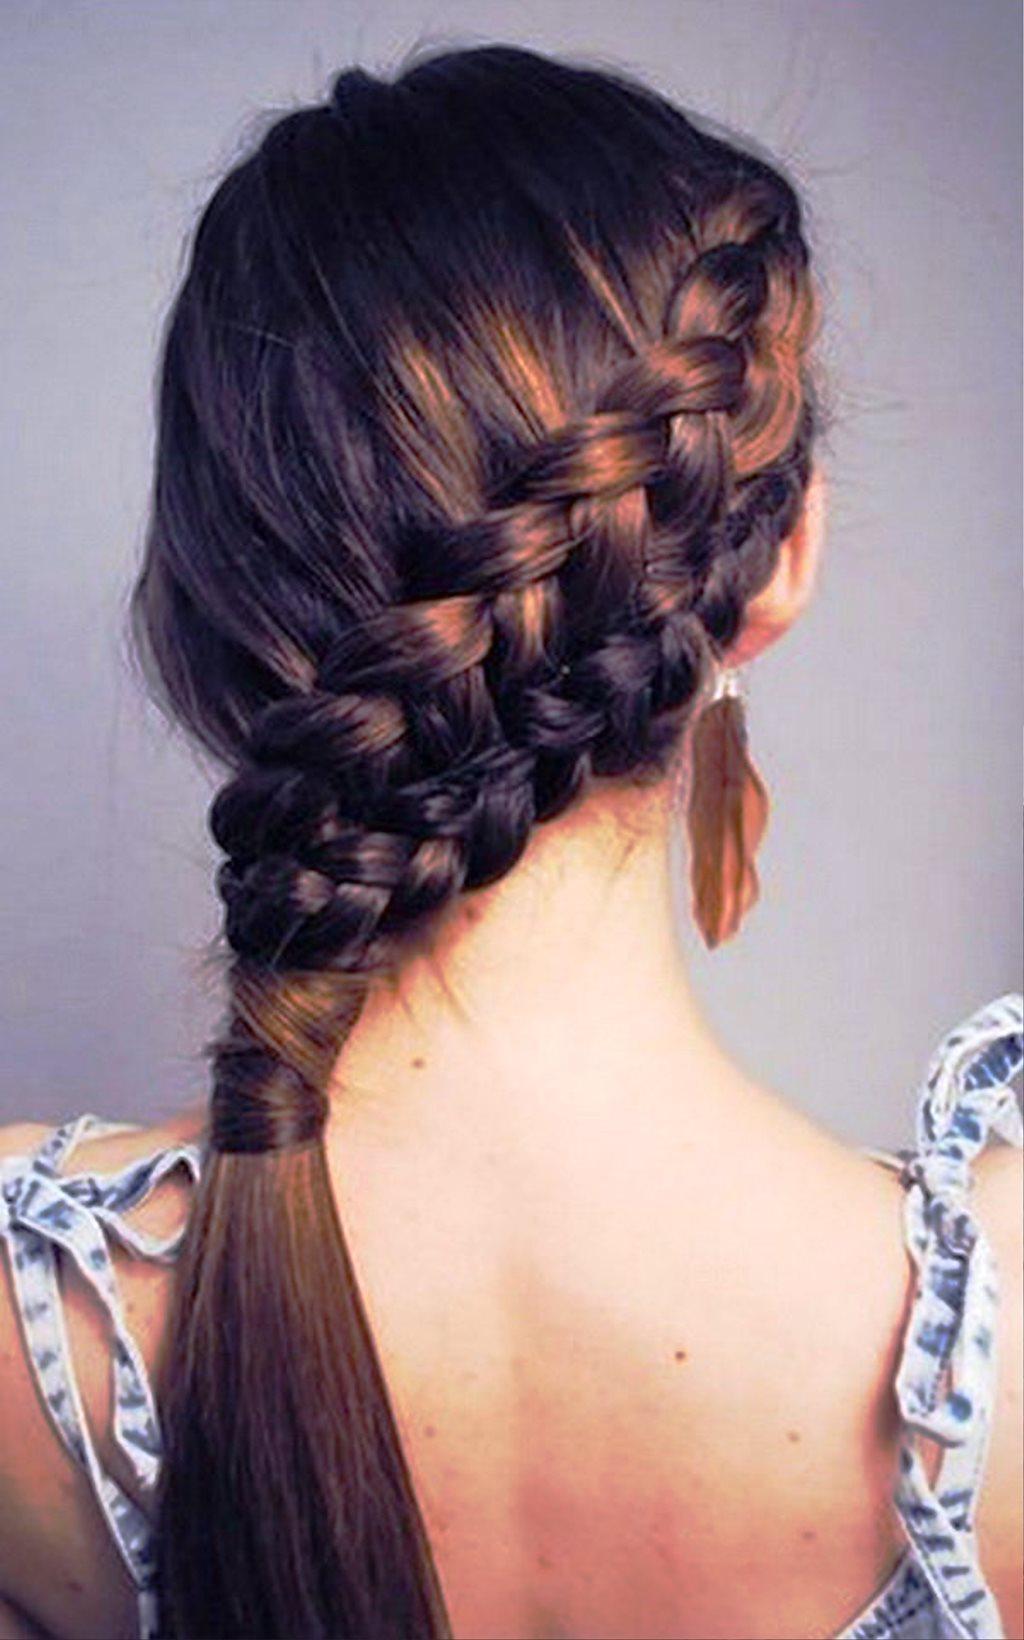 Astounding 20 Beautiful Pretty And Cute Hairstyles For School Hairstyles Hairstyles For Men Maxibearus